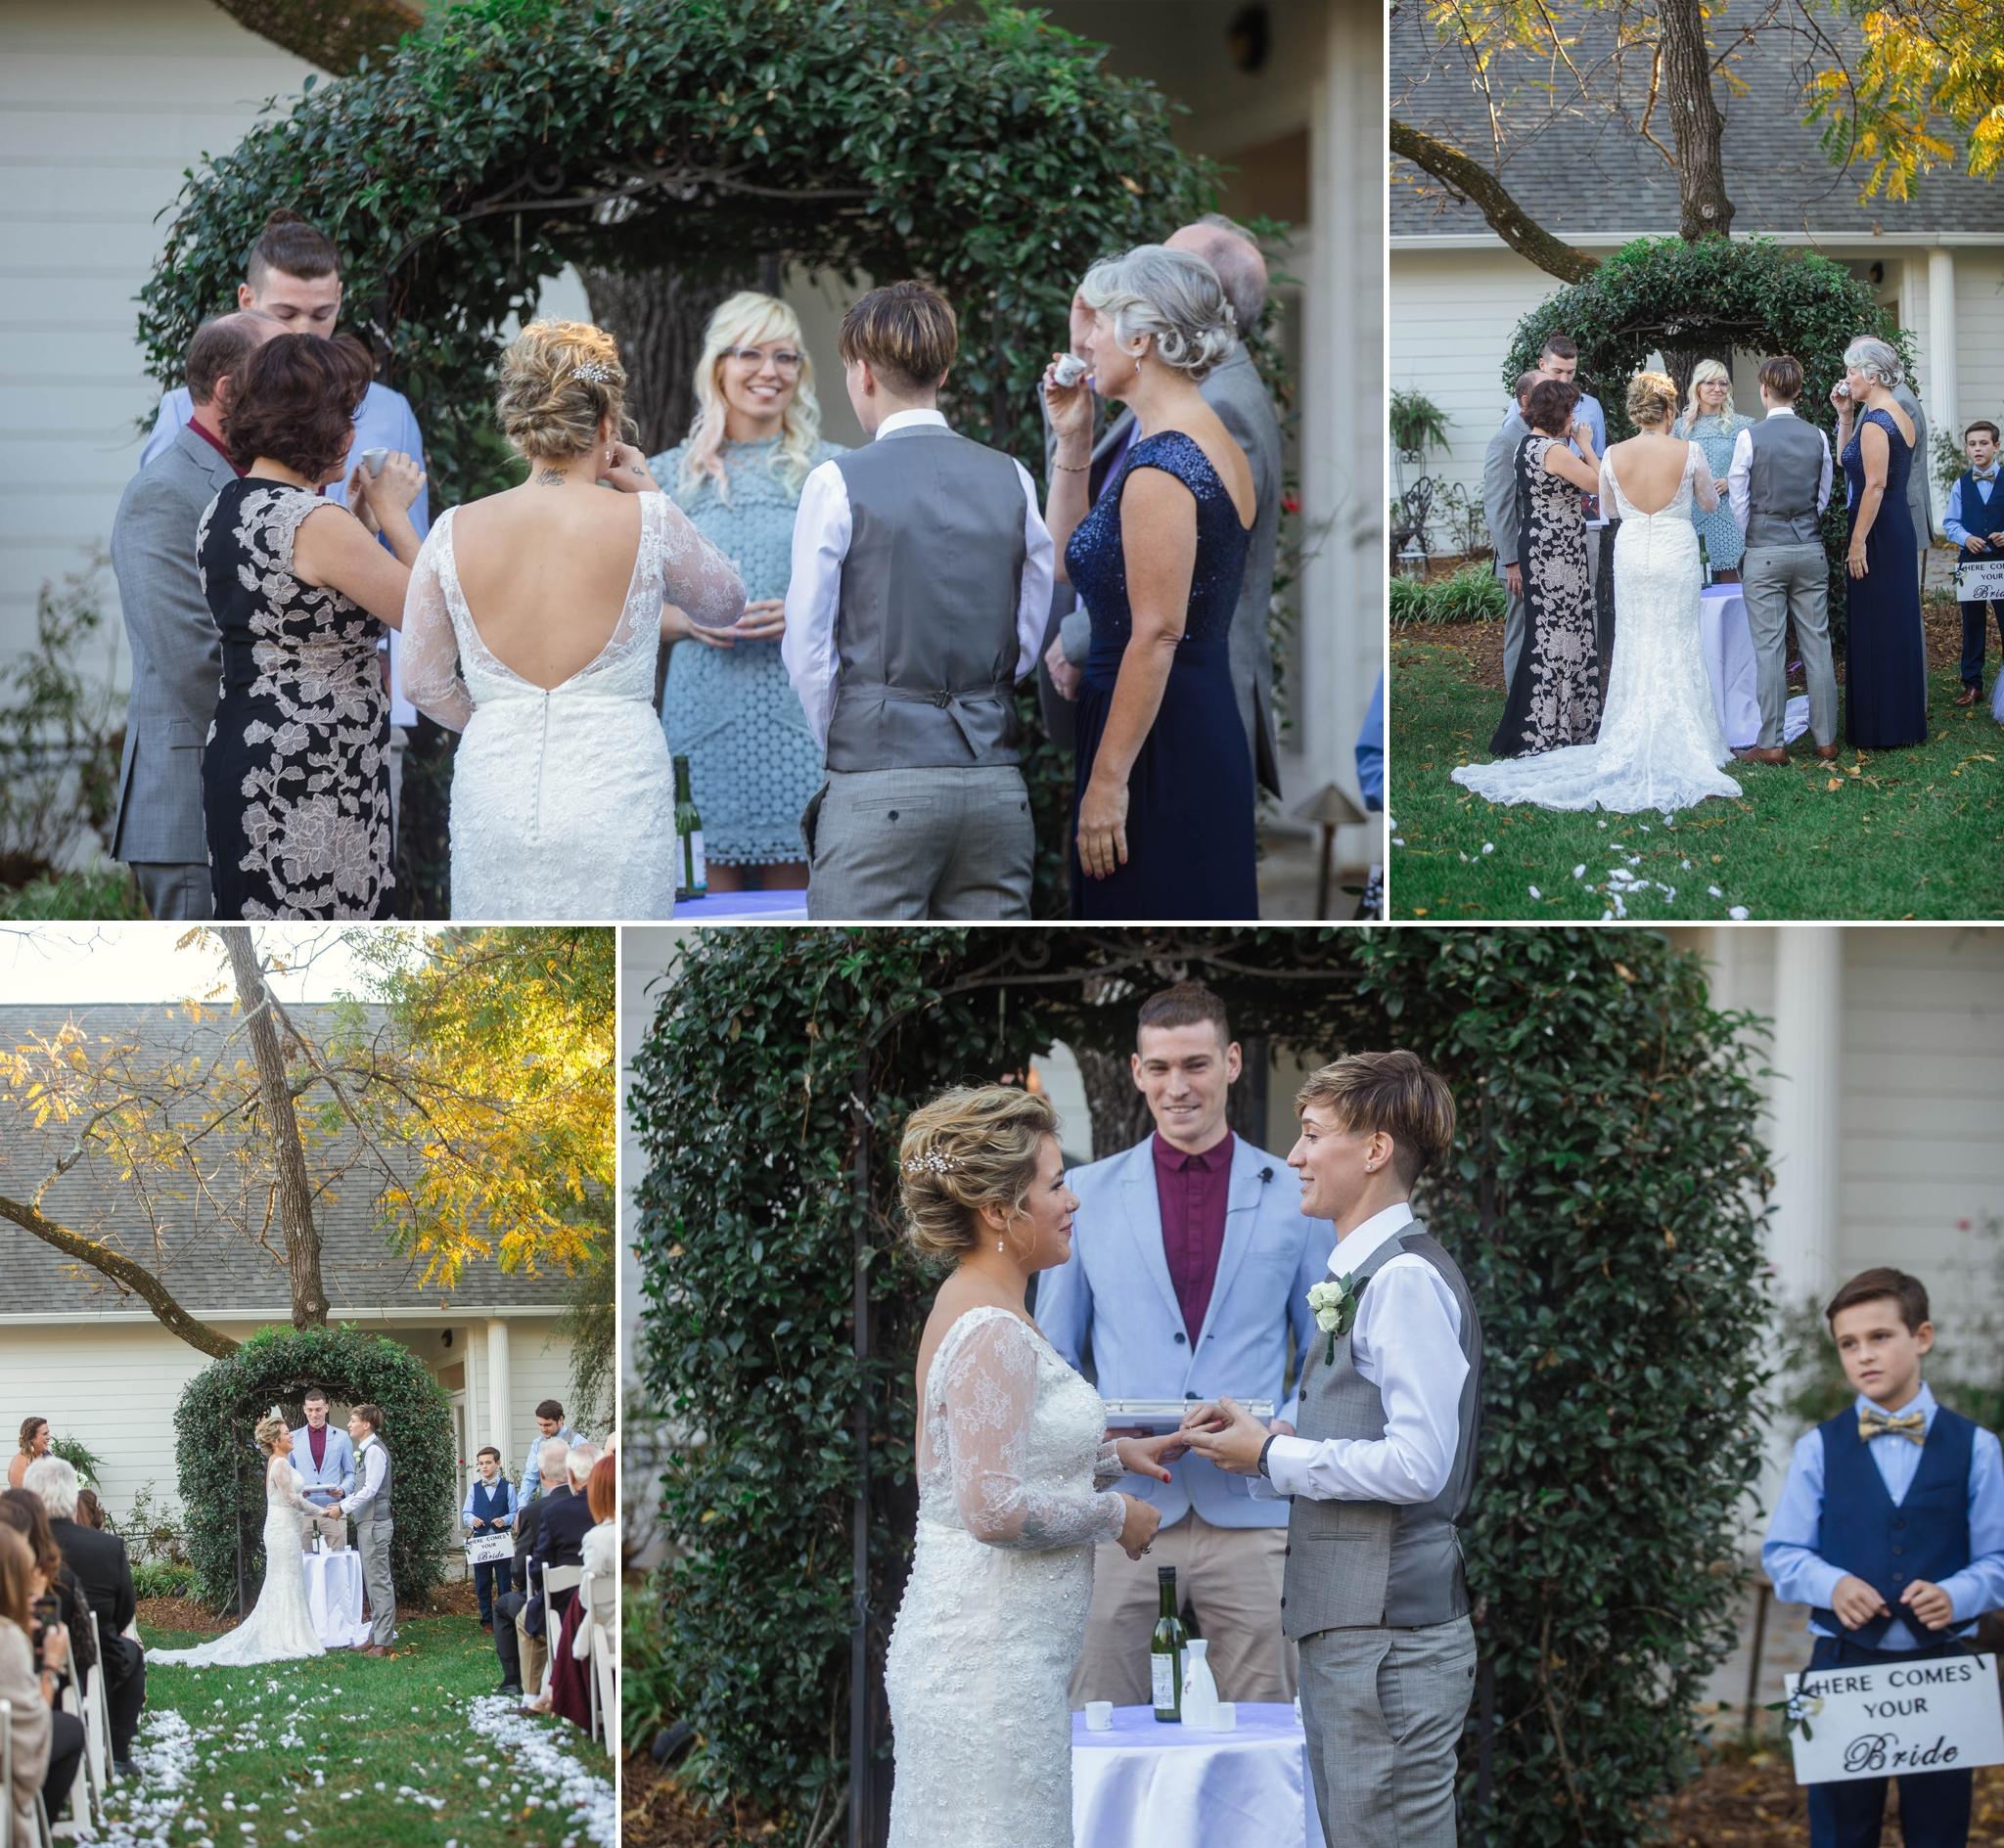 Gay Wedding Photography in North Carolina